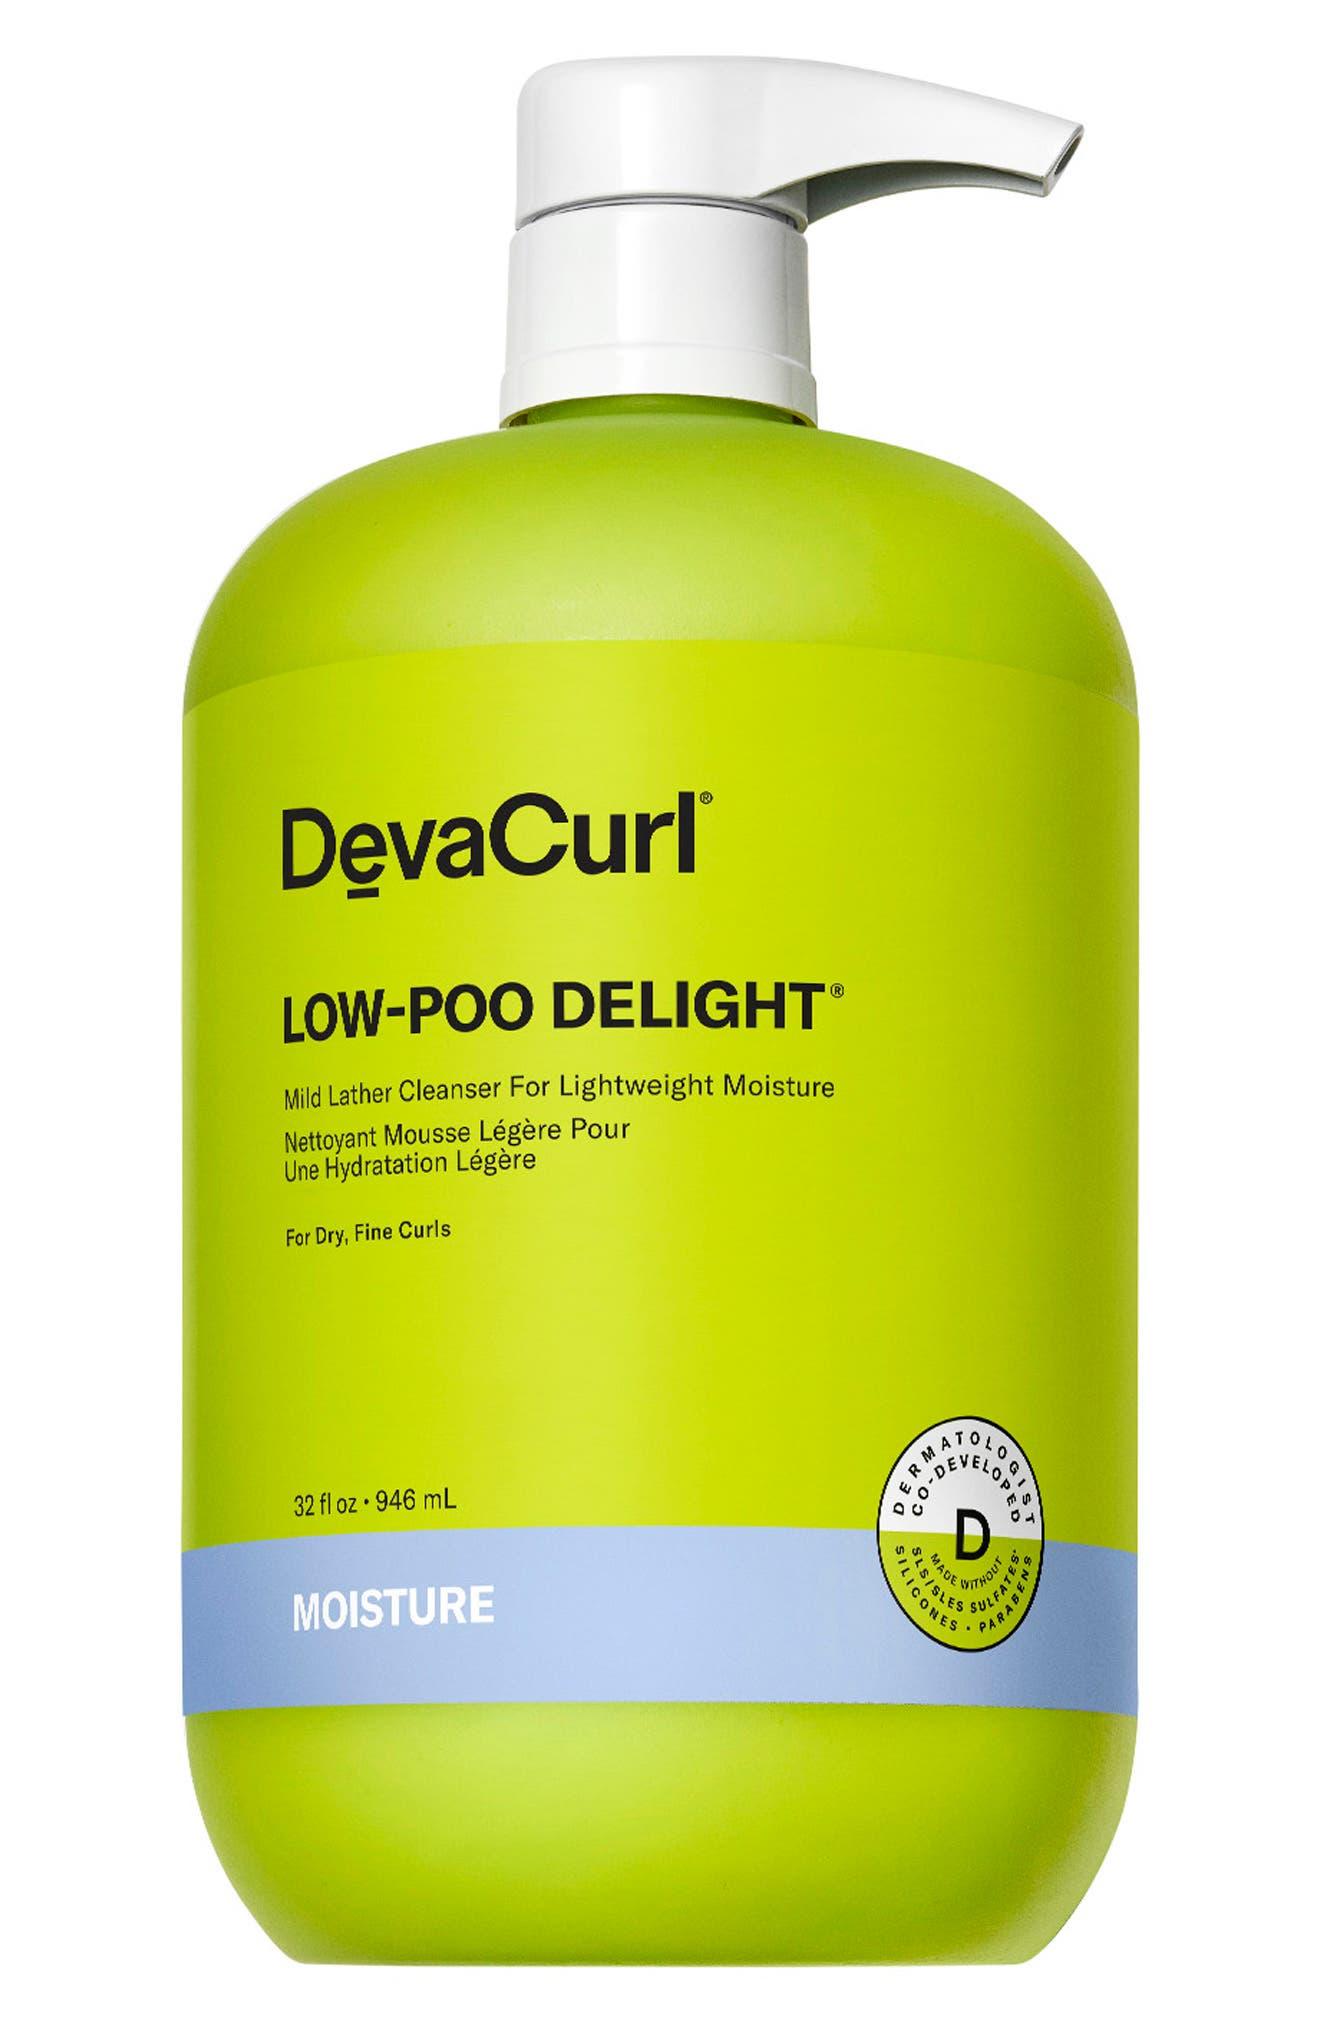 DevaCurl Jumbo Low-Poo Delight(R) Mild Lather Cleanser